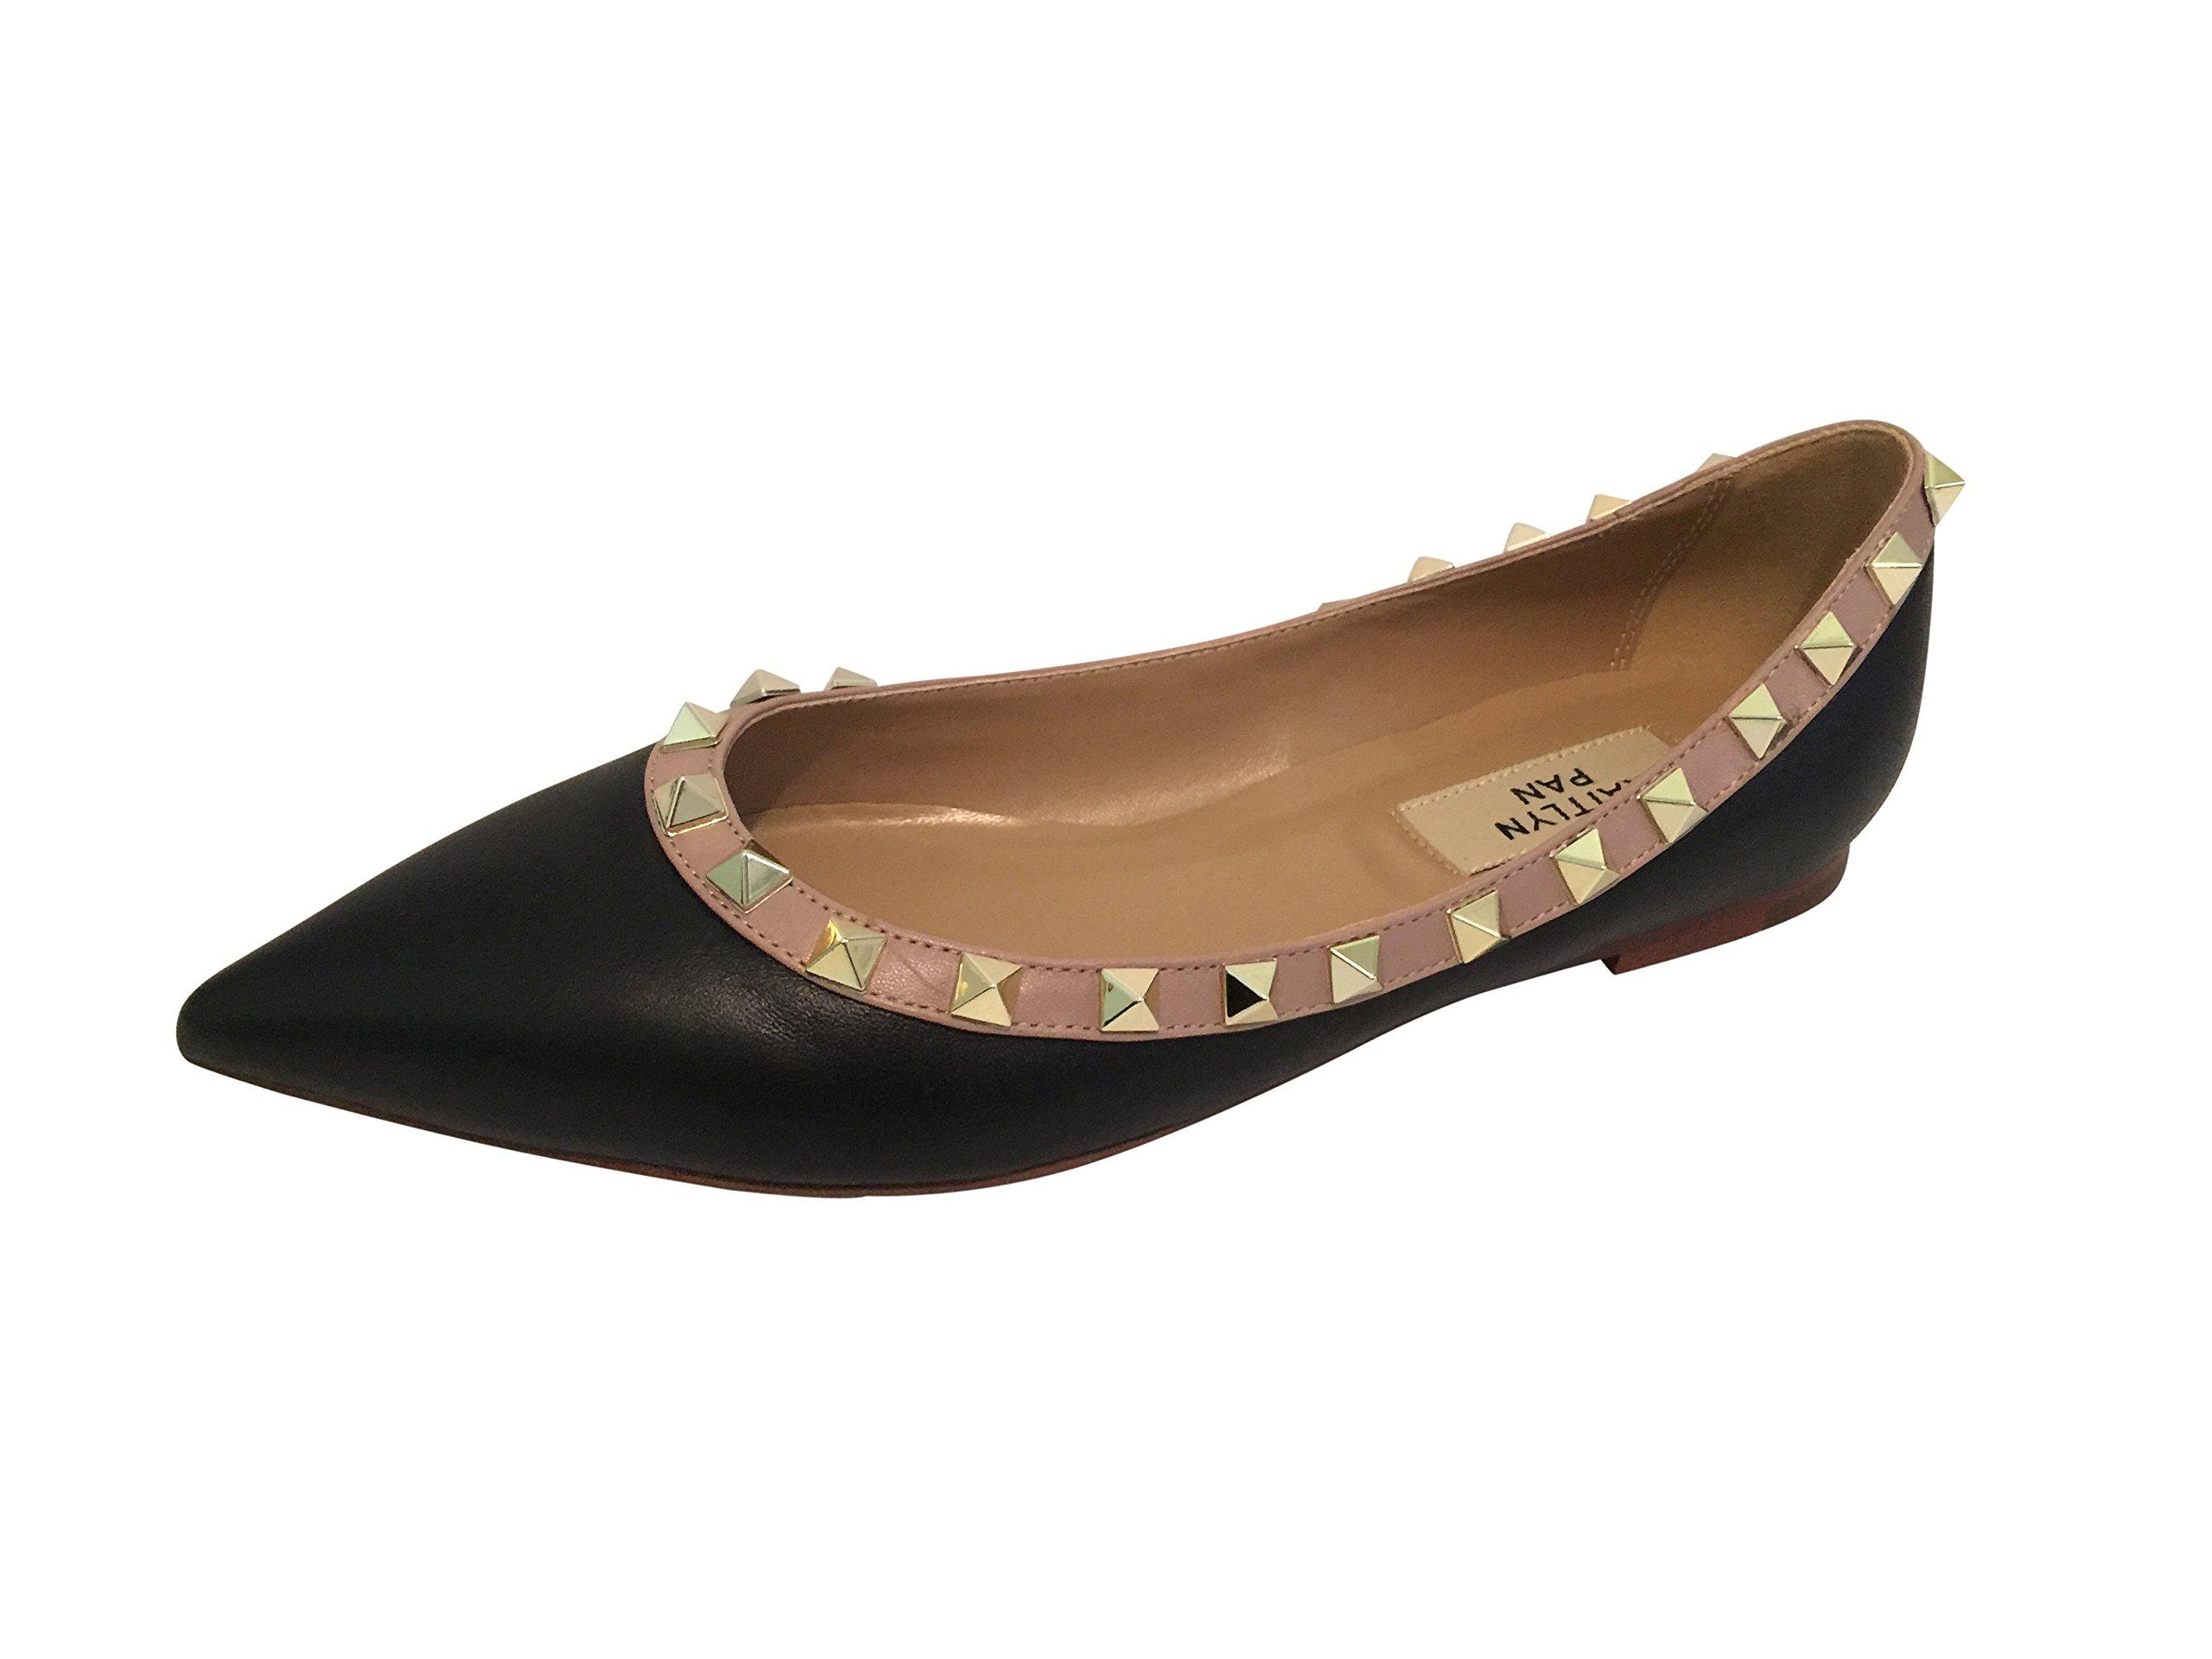 Kaitlyn Pan RockStud Ballerina Leather Flats,Black Matte/Nude Trim/Gold Studs,9US/ 40EU/ 41CN